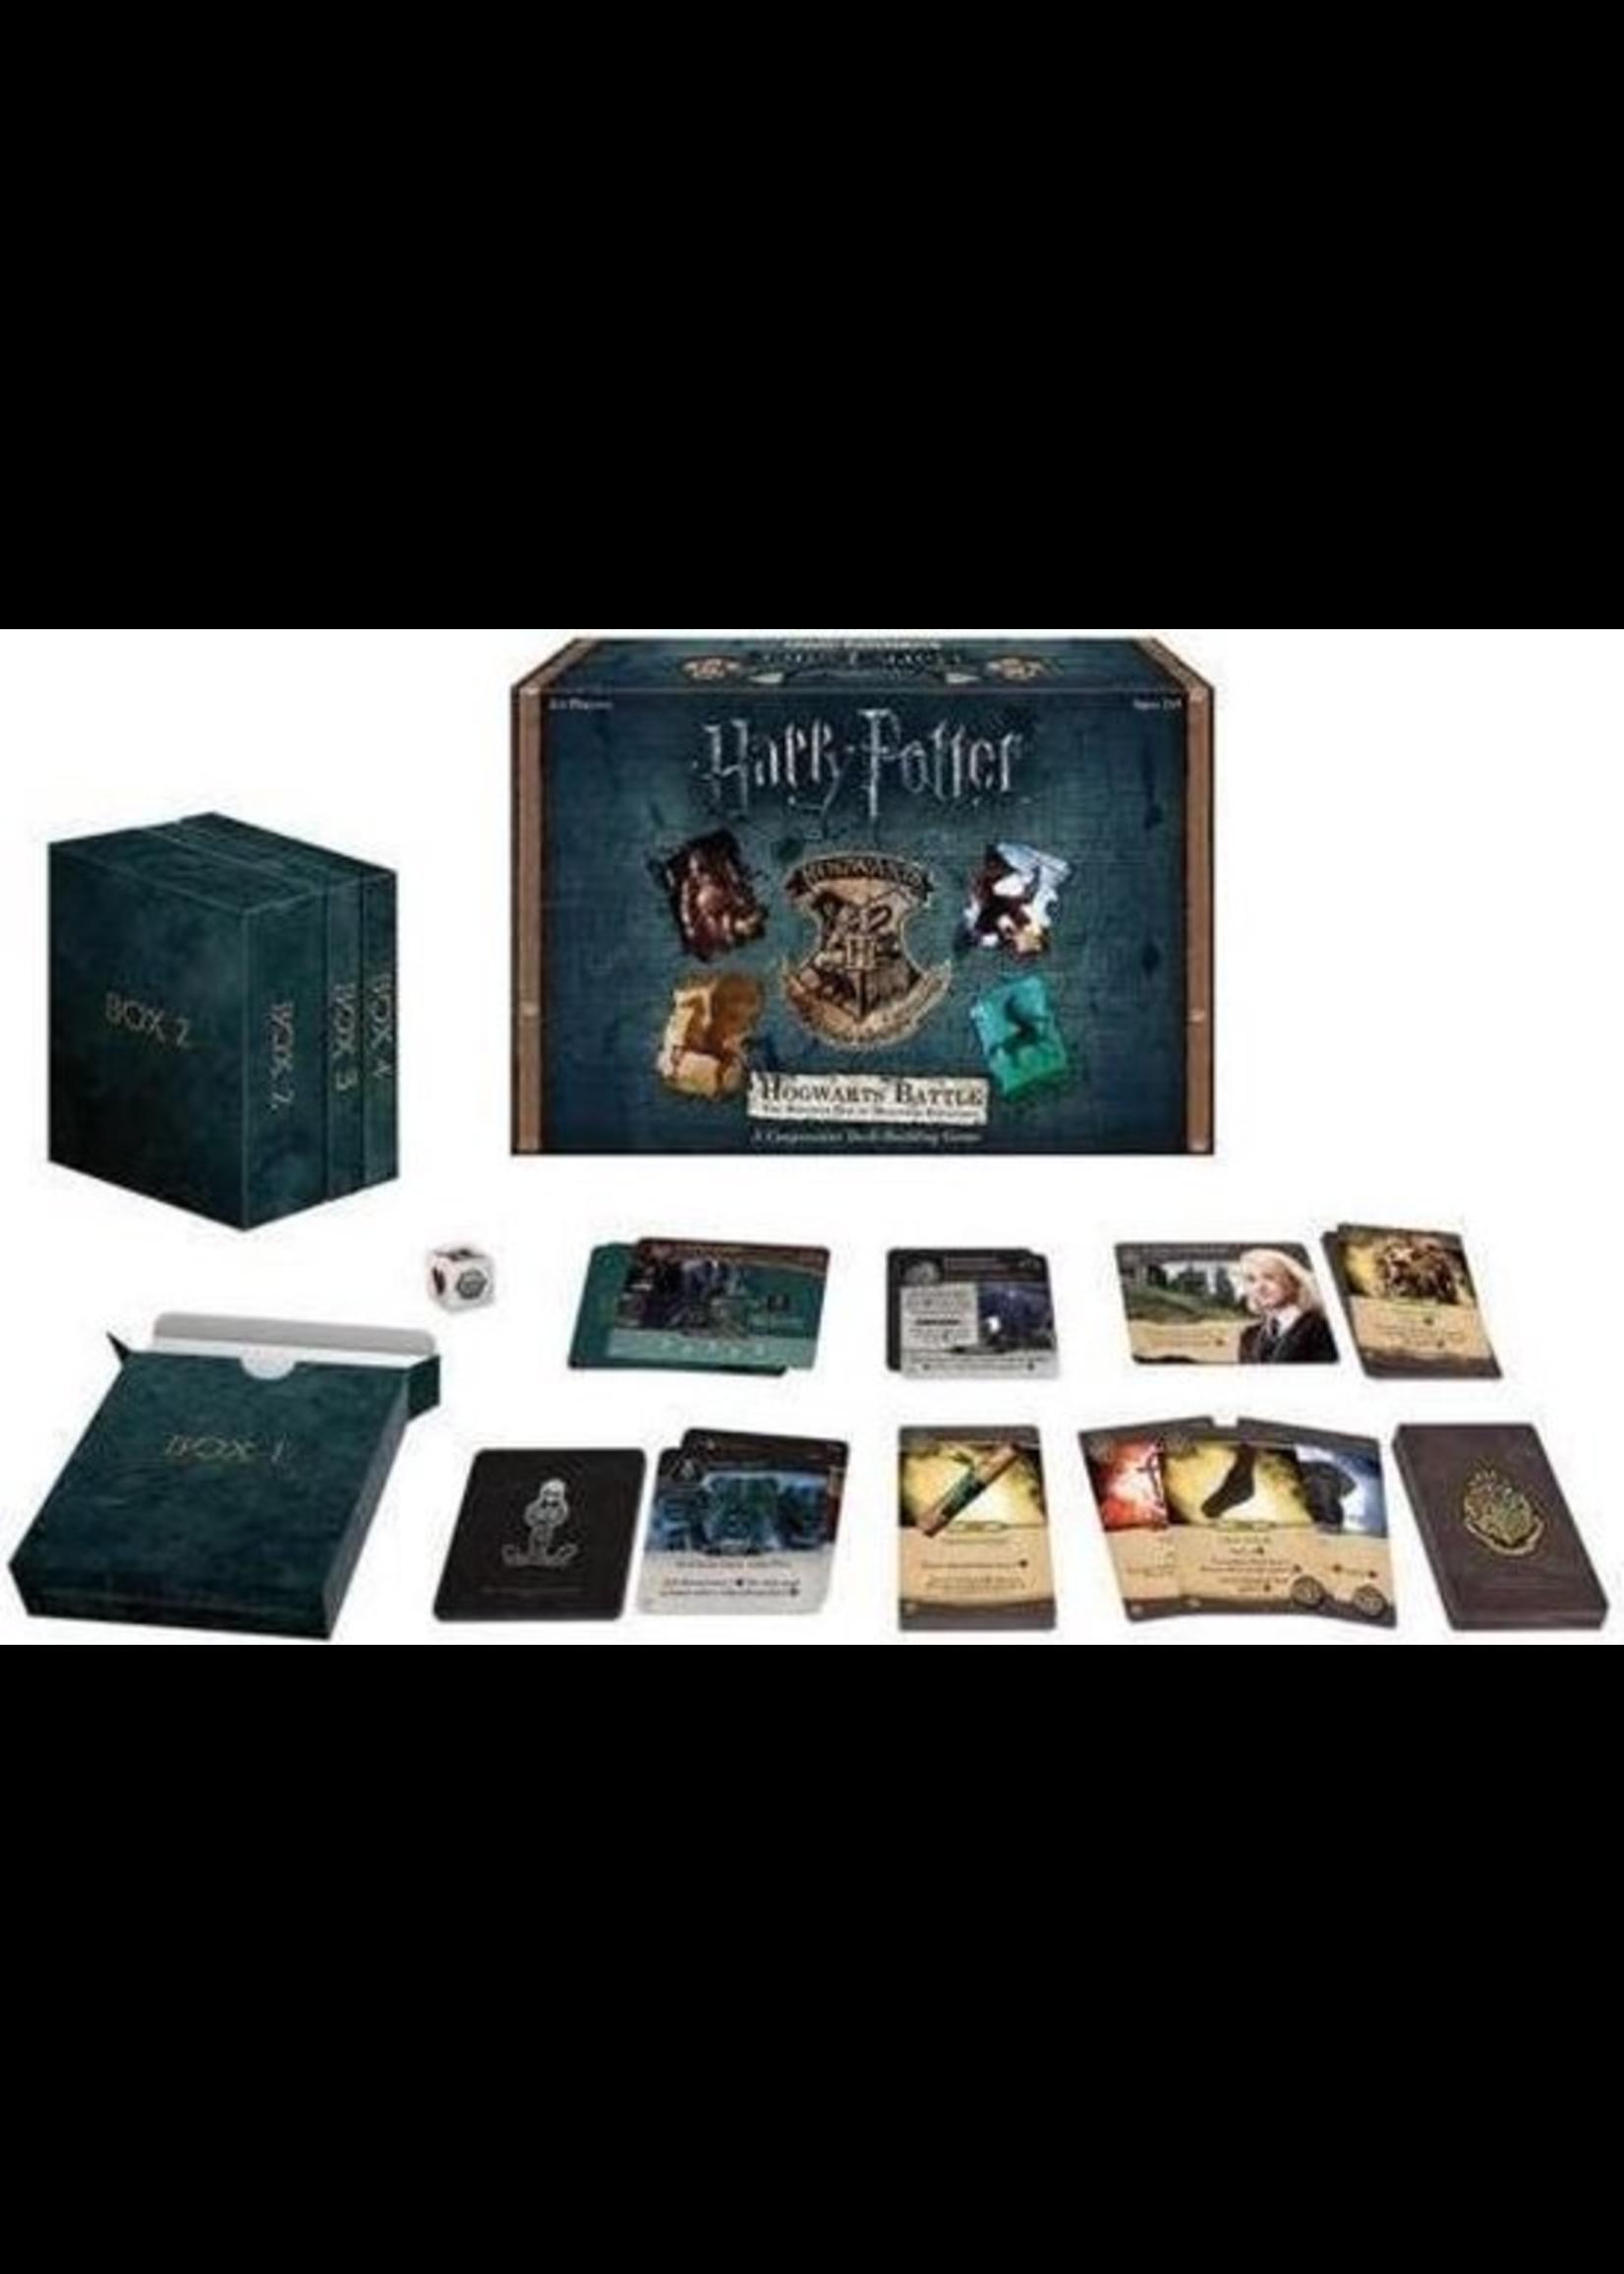 Harry Potter Hogwarts Battle - The Monster Box of Monsters Expansion